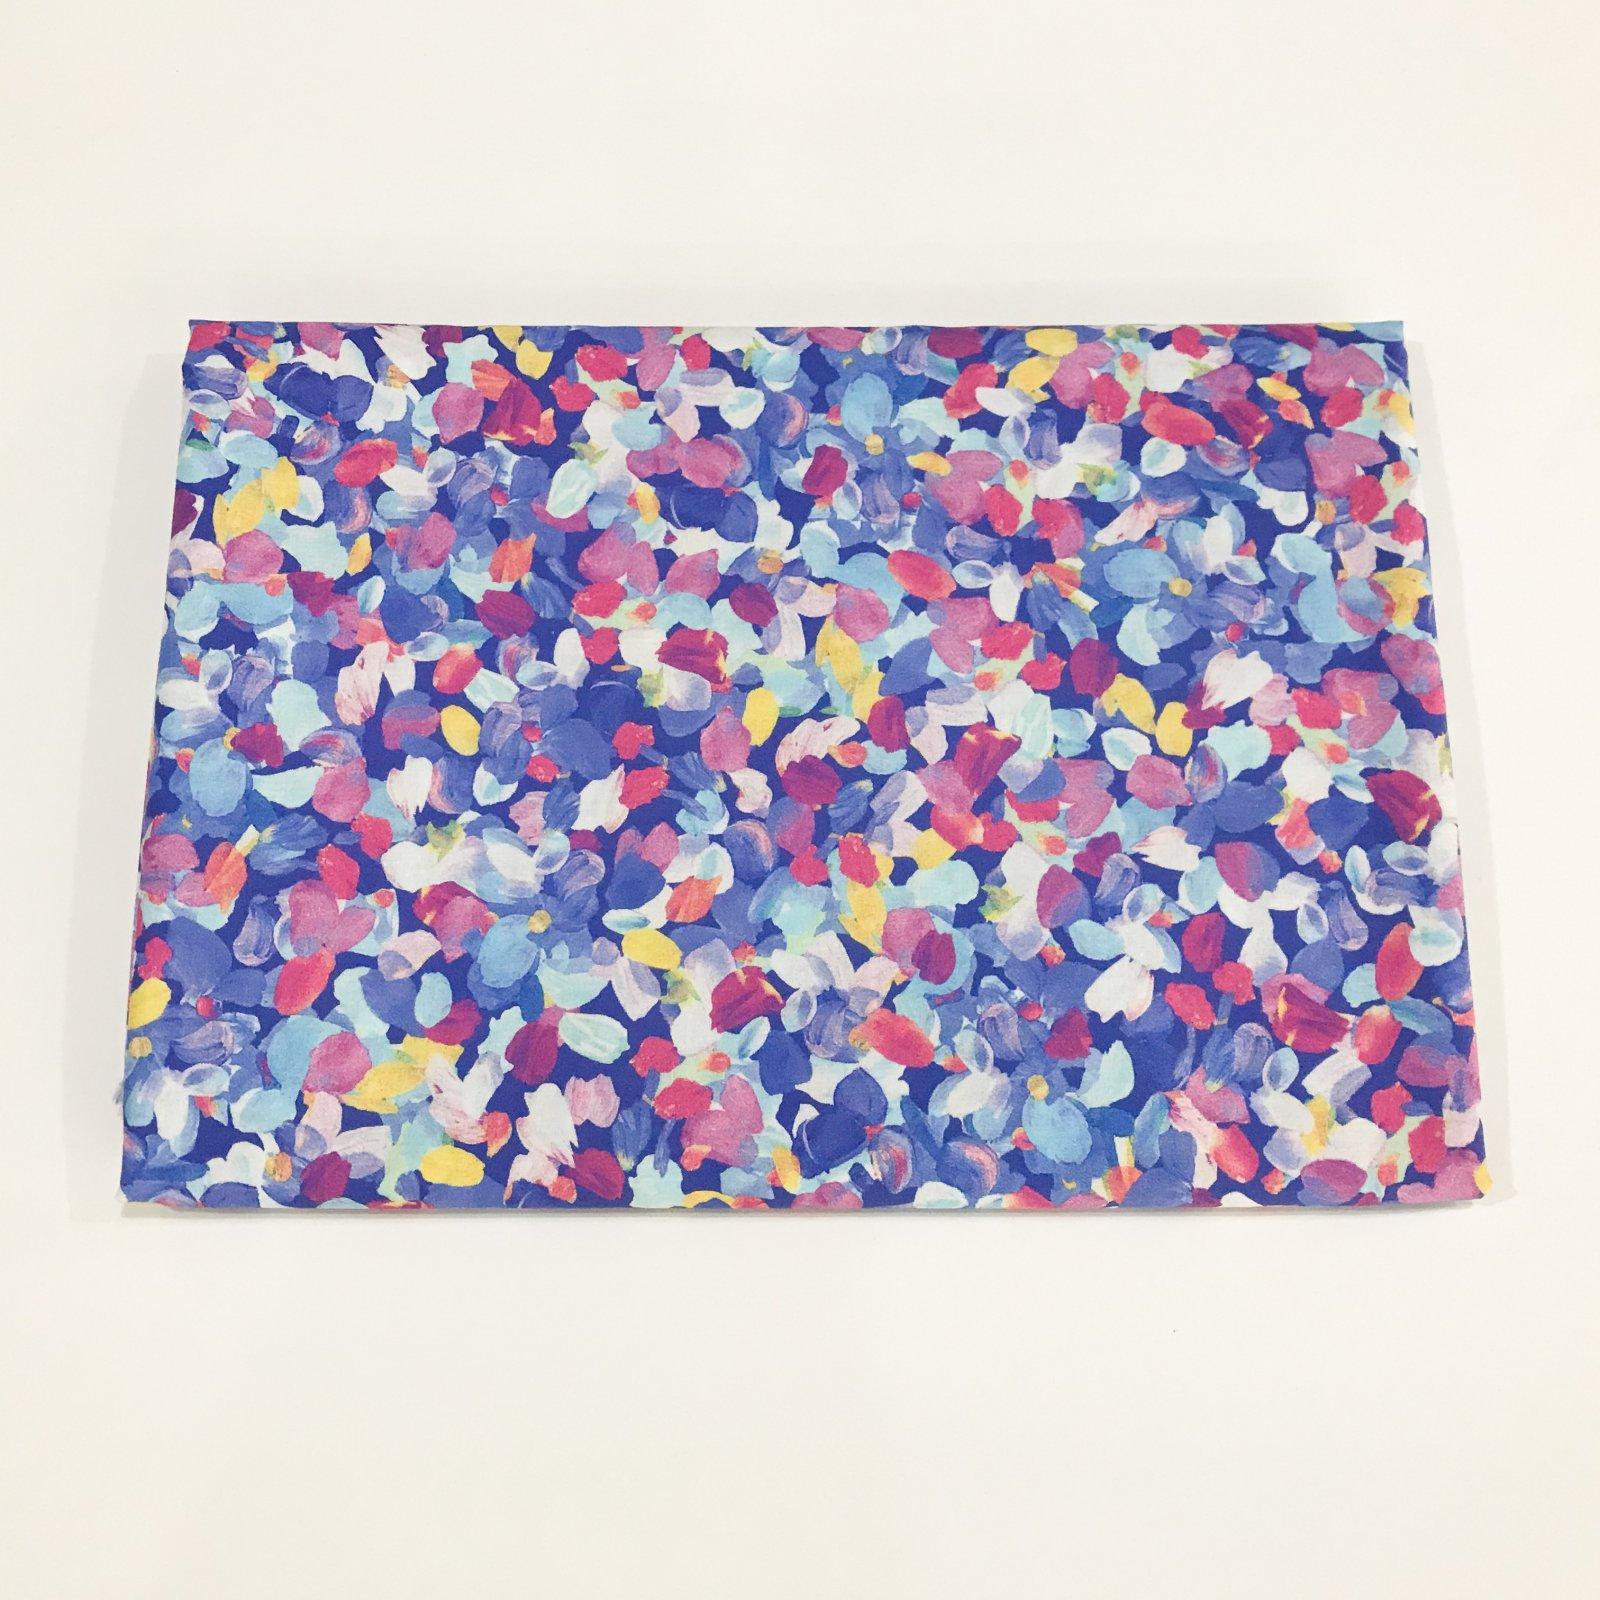 1 3/4 yard - Cotton Lawn - Periwinkle Petals